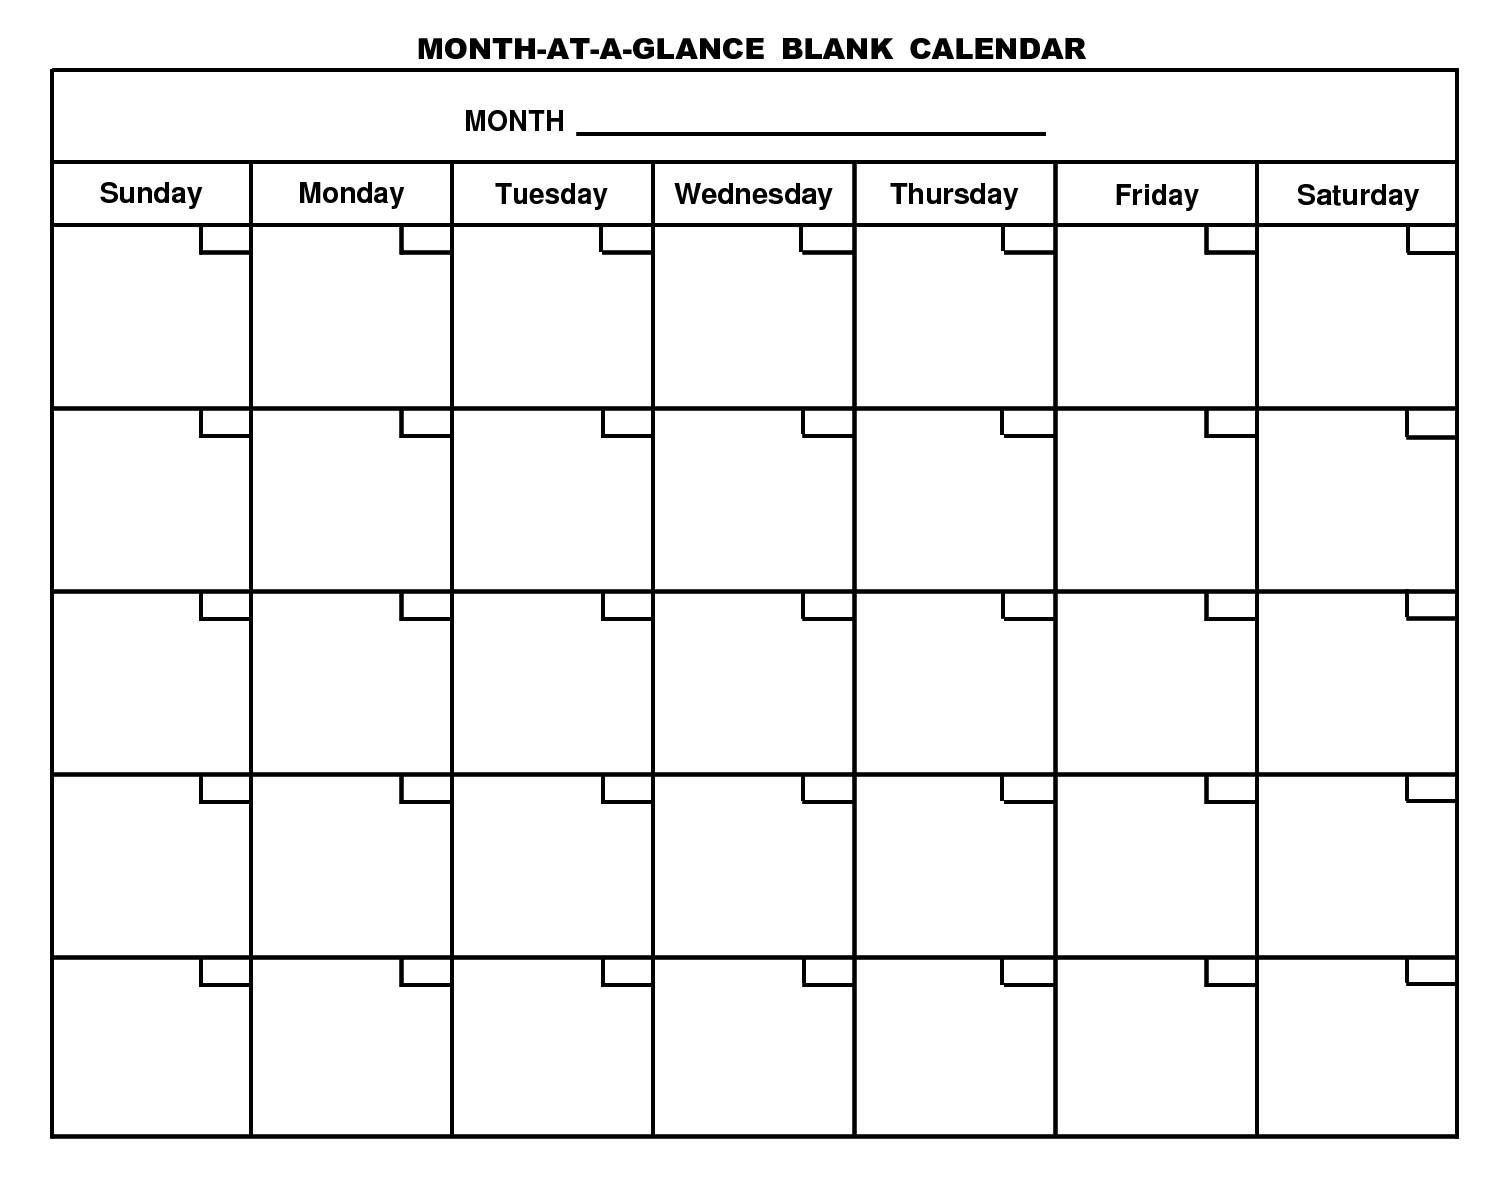 001 Rare Free Printable Blank Monthly Calendar Template High Resolution Full